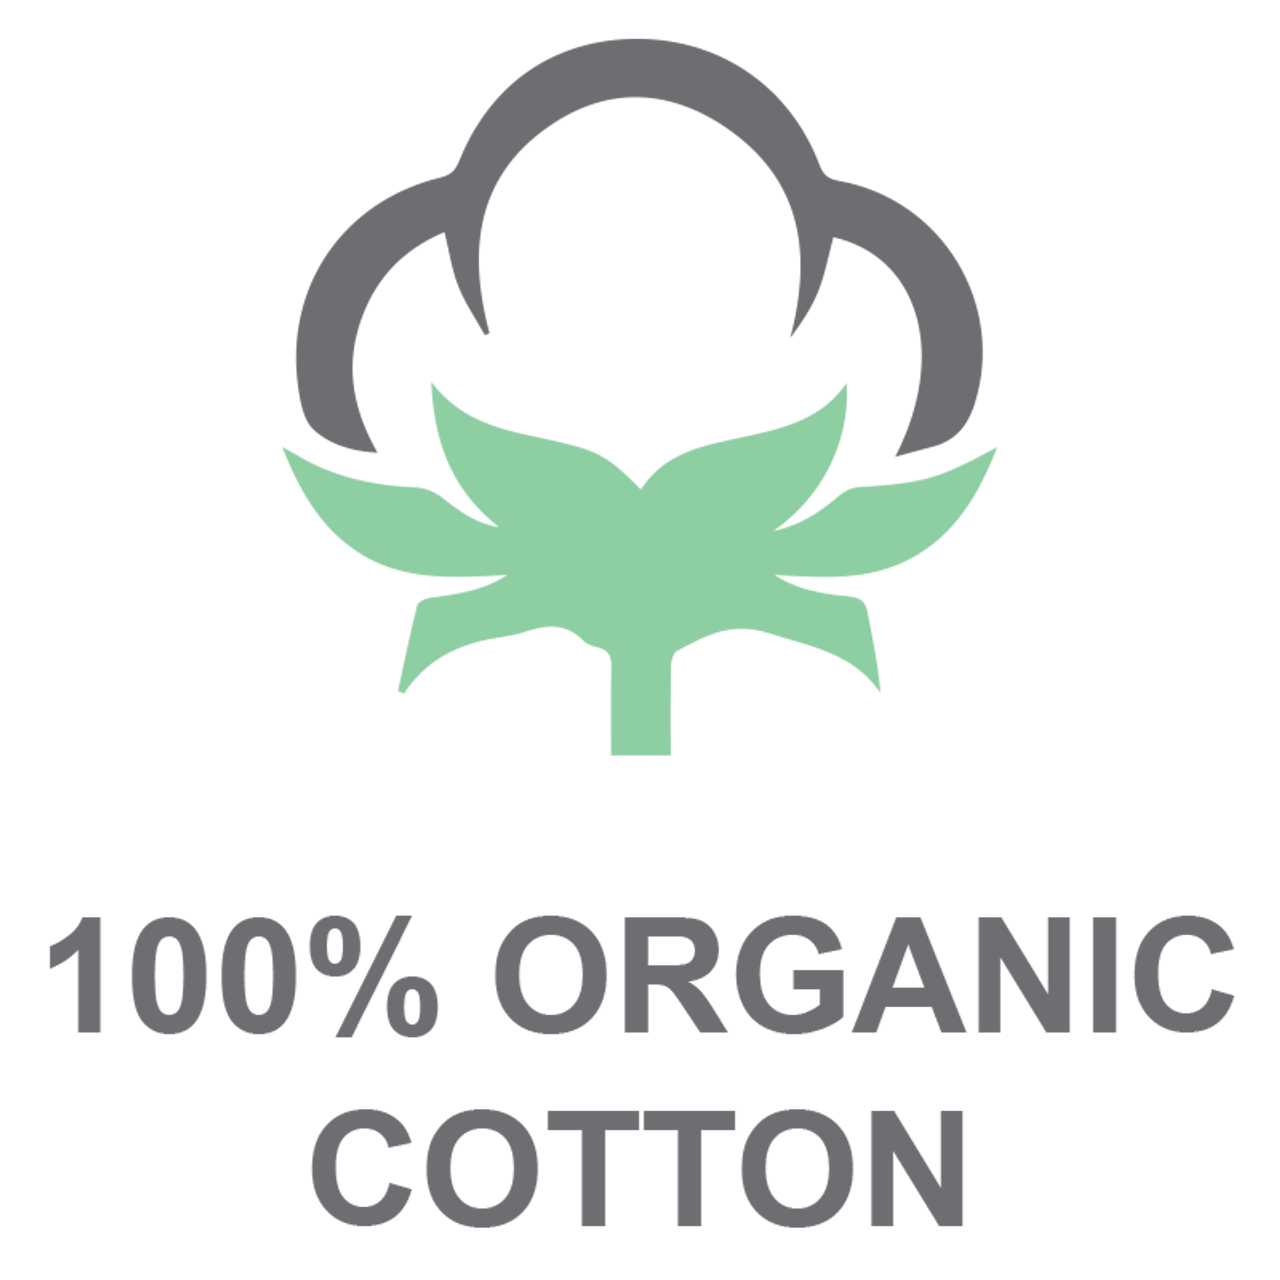 Sleep & Beyond 100% Organic Cotton Waterproof Mattress Protector 100& Organic Cotton